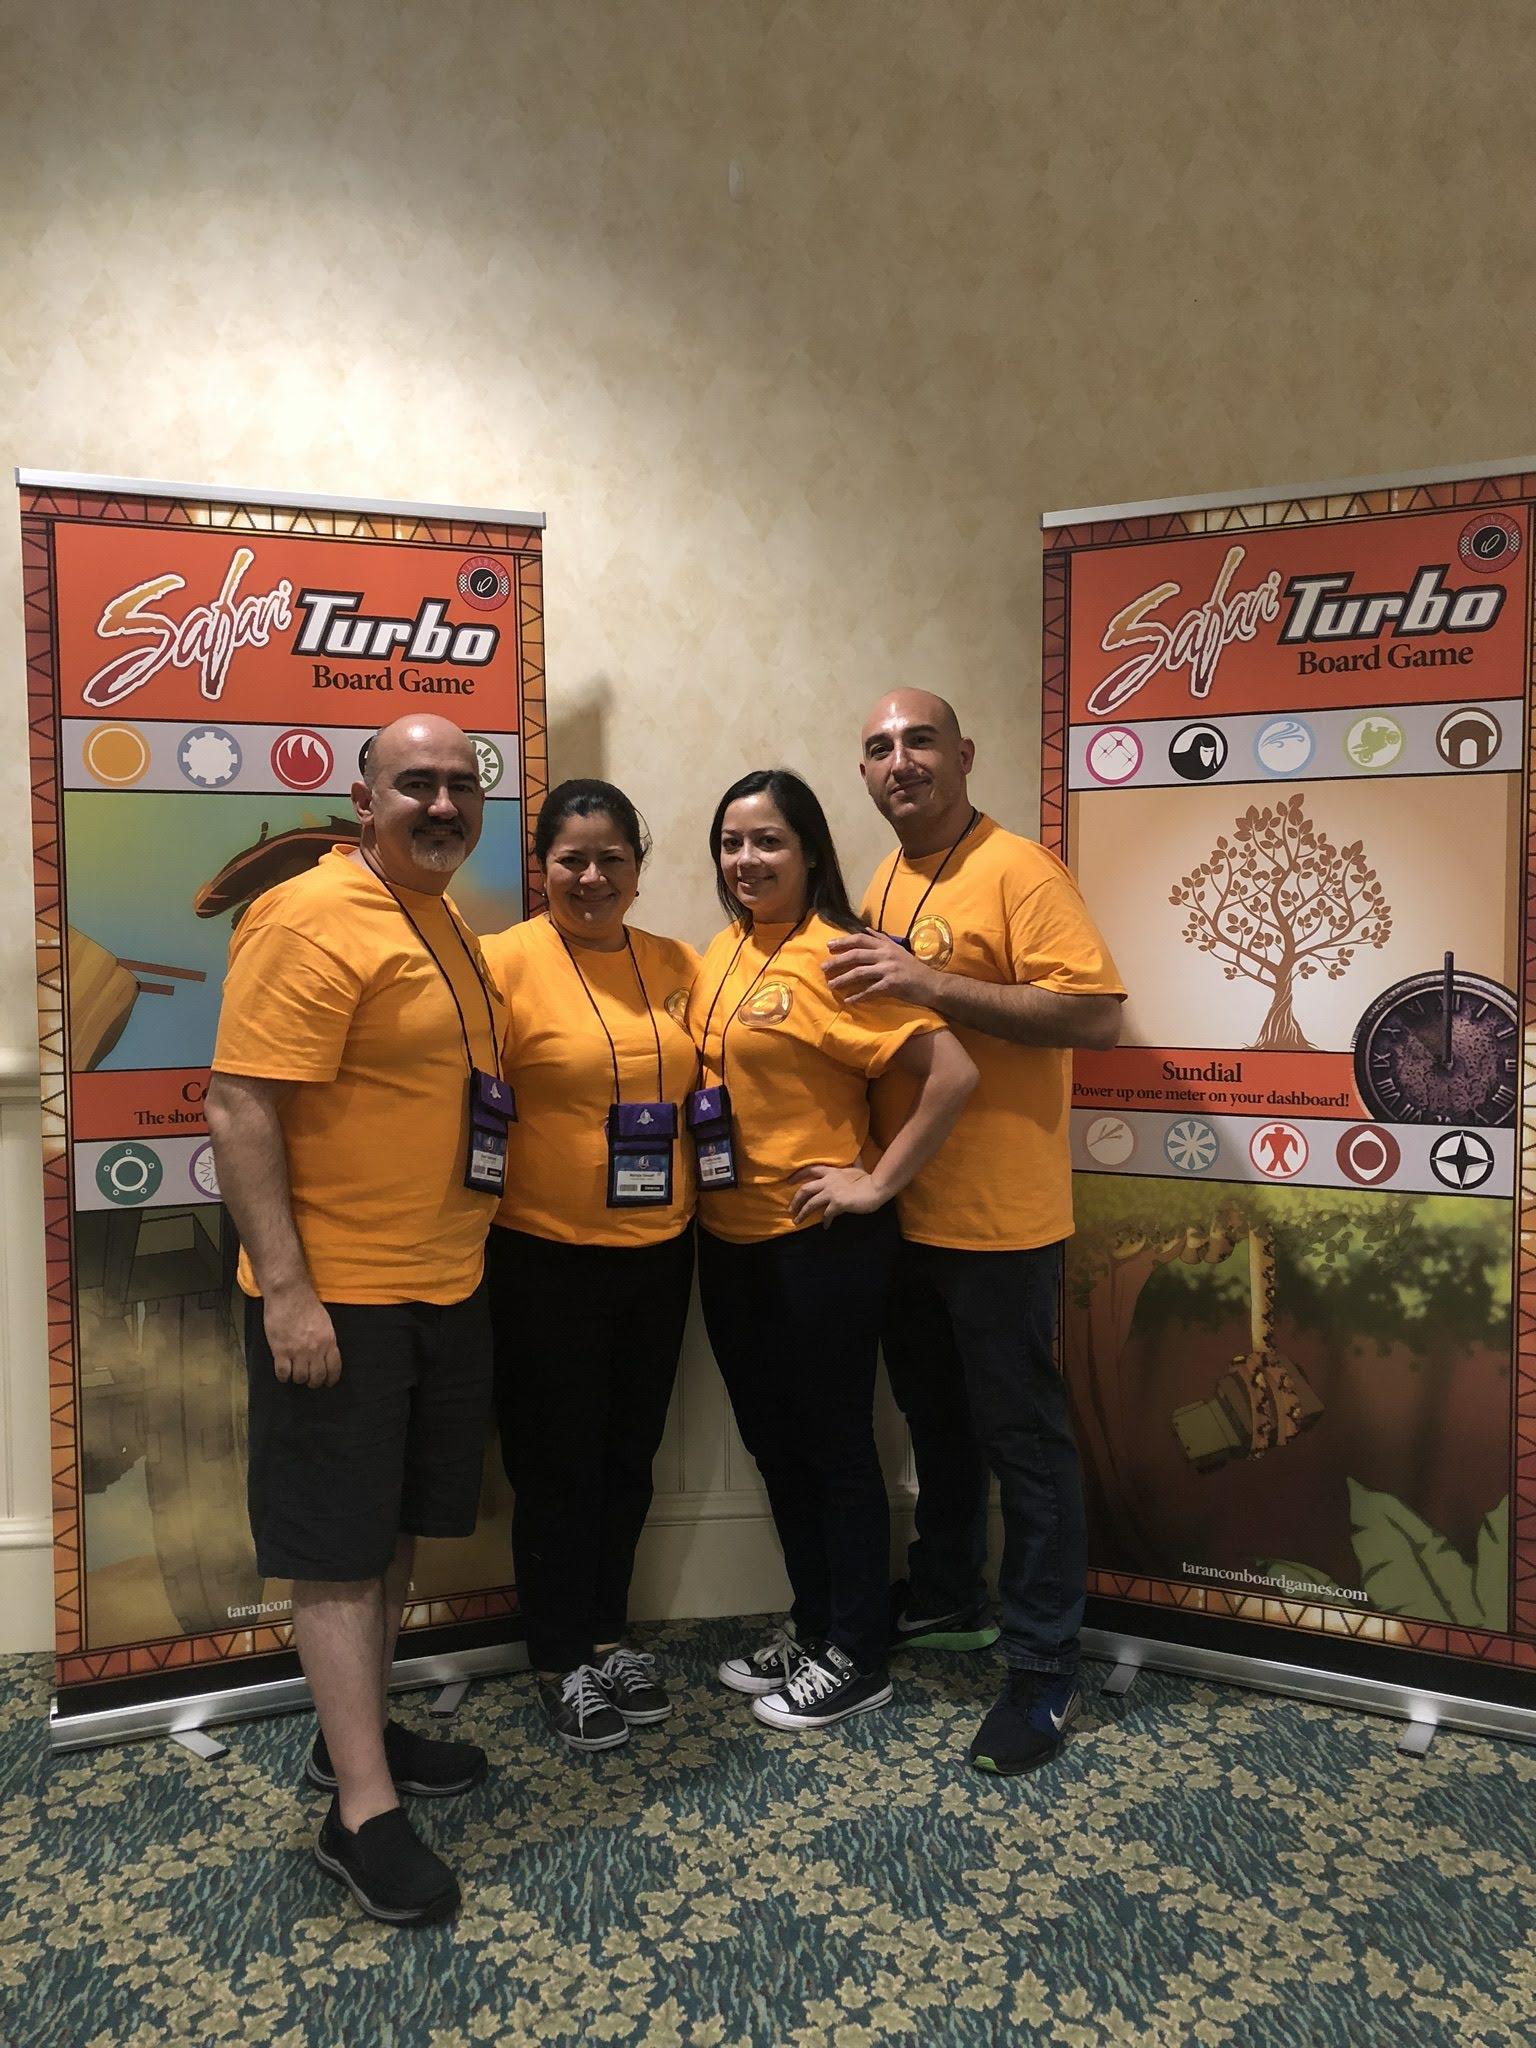 The Safari Turbo Team